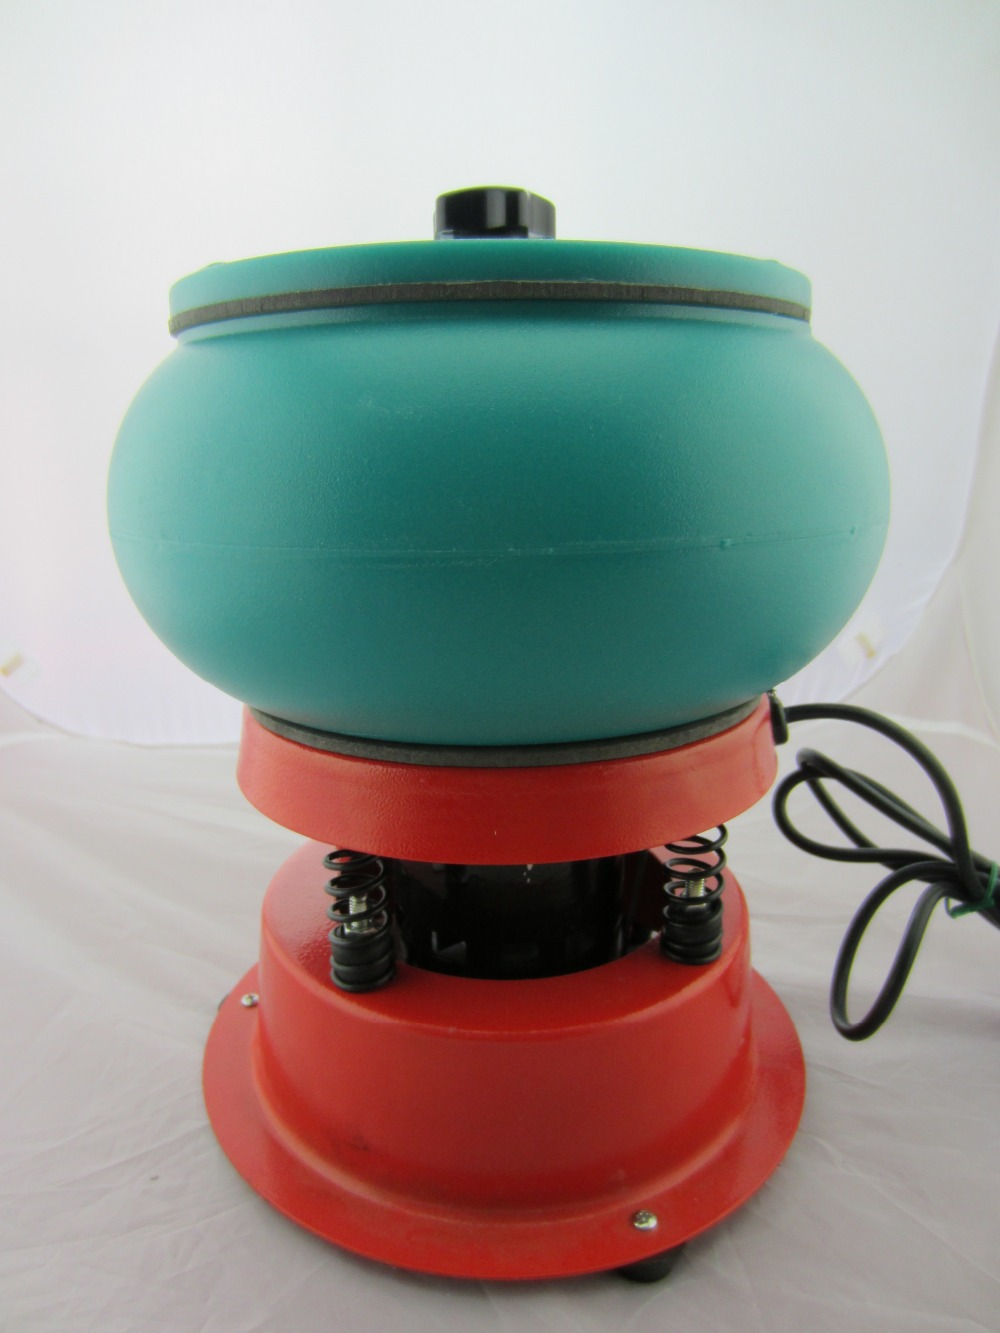 3kg Mini Vibratory Media Tumbler, Wet cleaning tumbler,jewelry Finisher Lapidary Vibratory Tumbler,Gemstone Polishing Machine